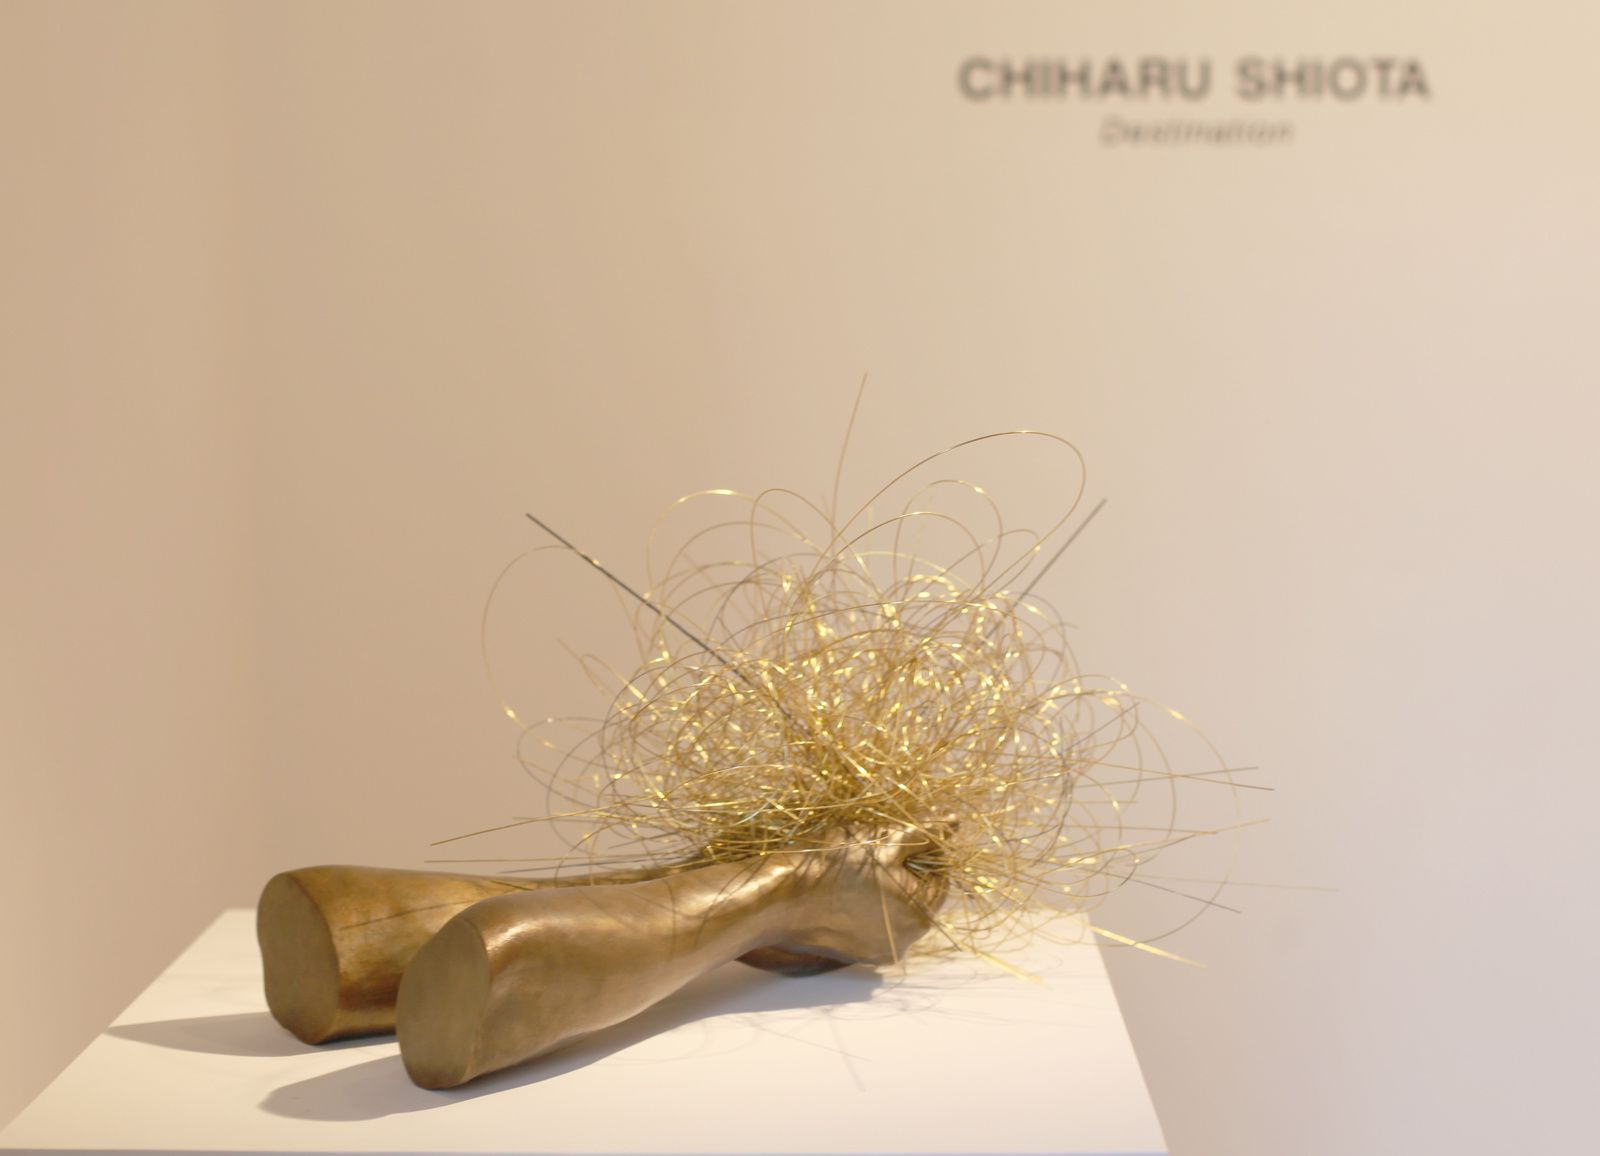 """In the Hand II"", 2017 de Chiharu SHIOTA - Courtesy Galerie Templon © Photo Éric Simon"